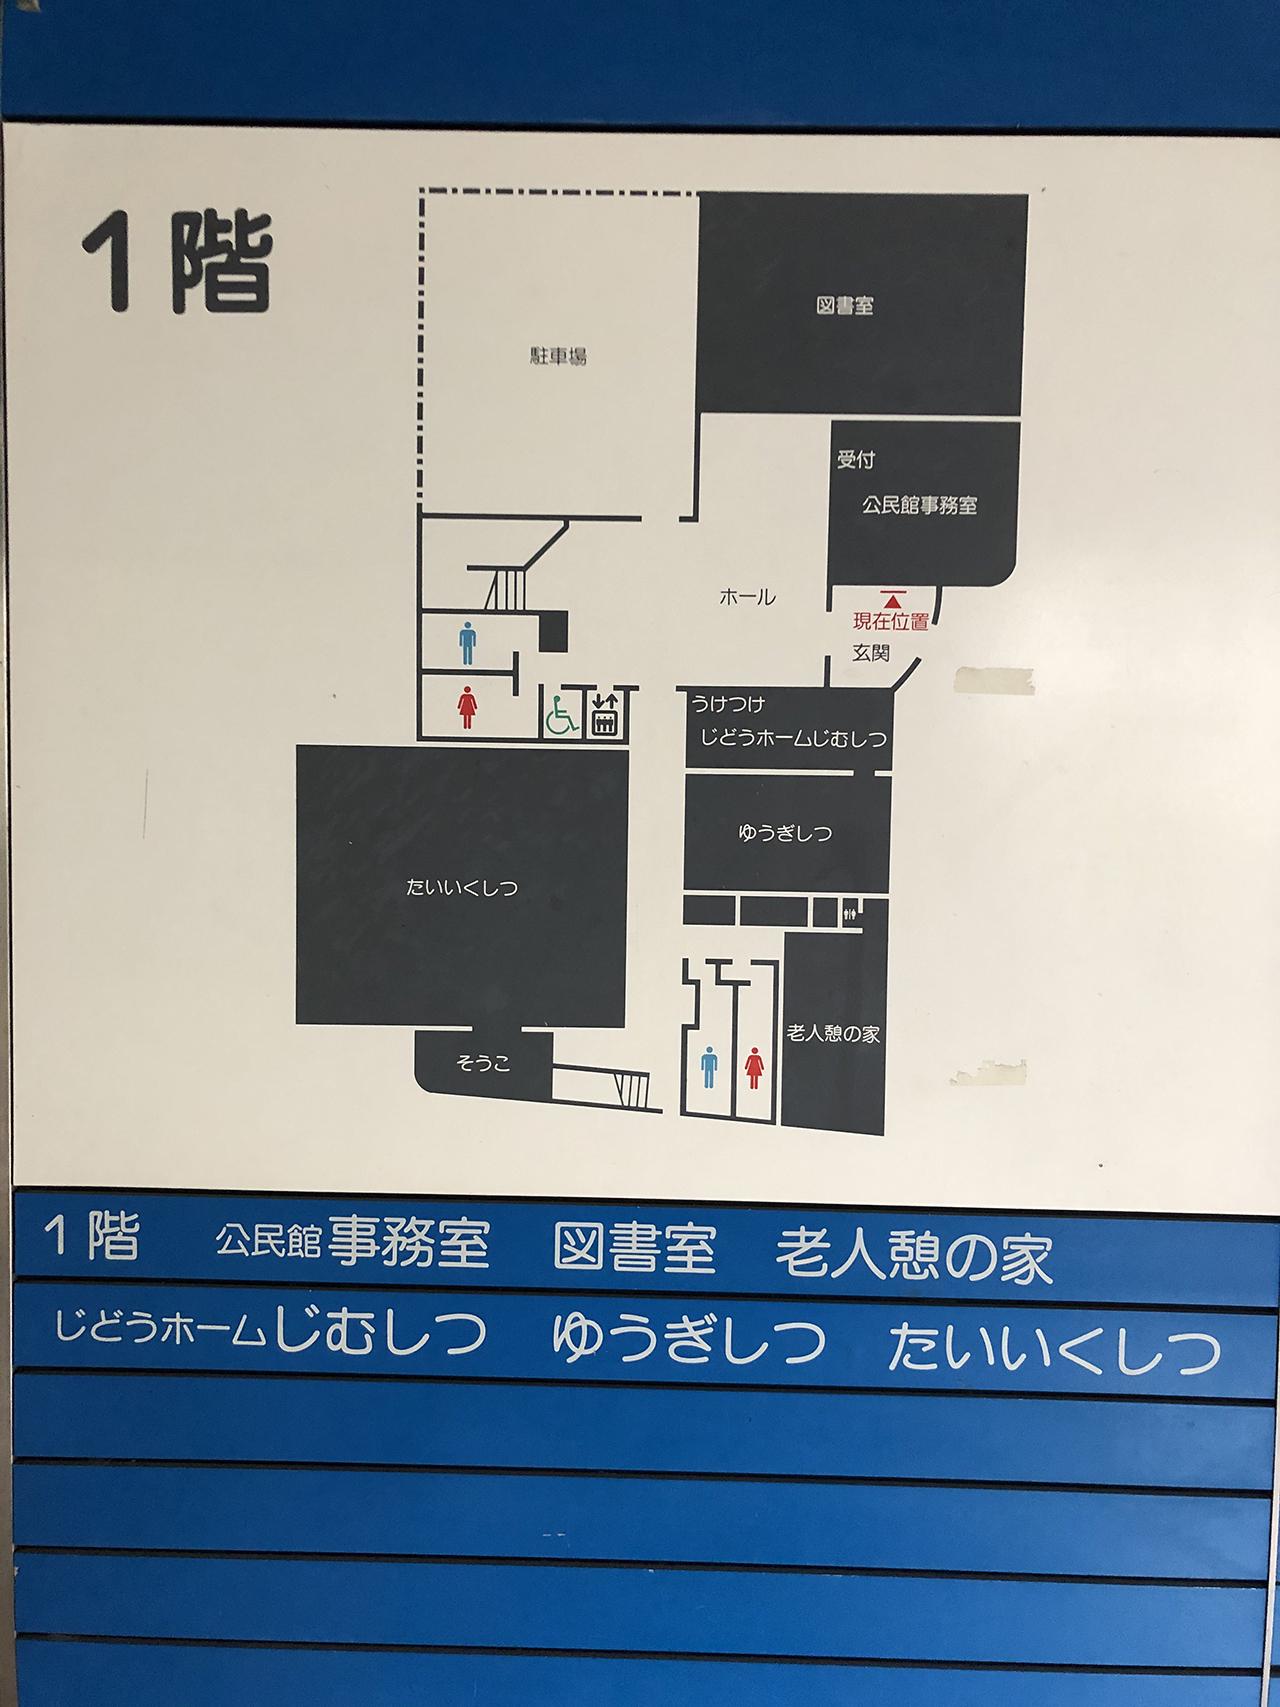 1Fの館内案内図の写真